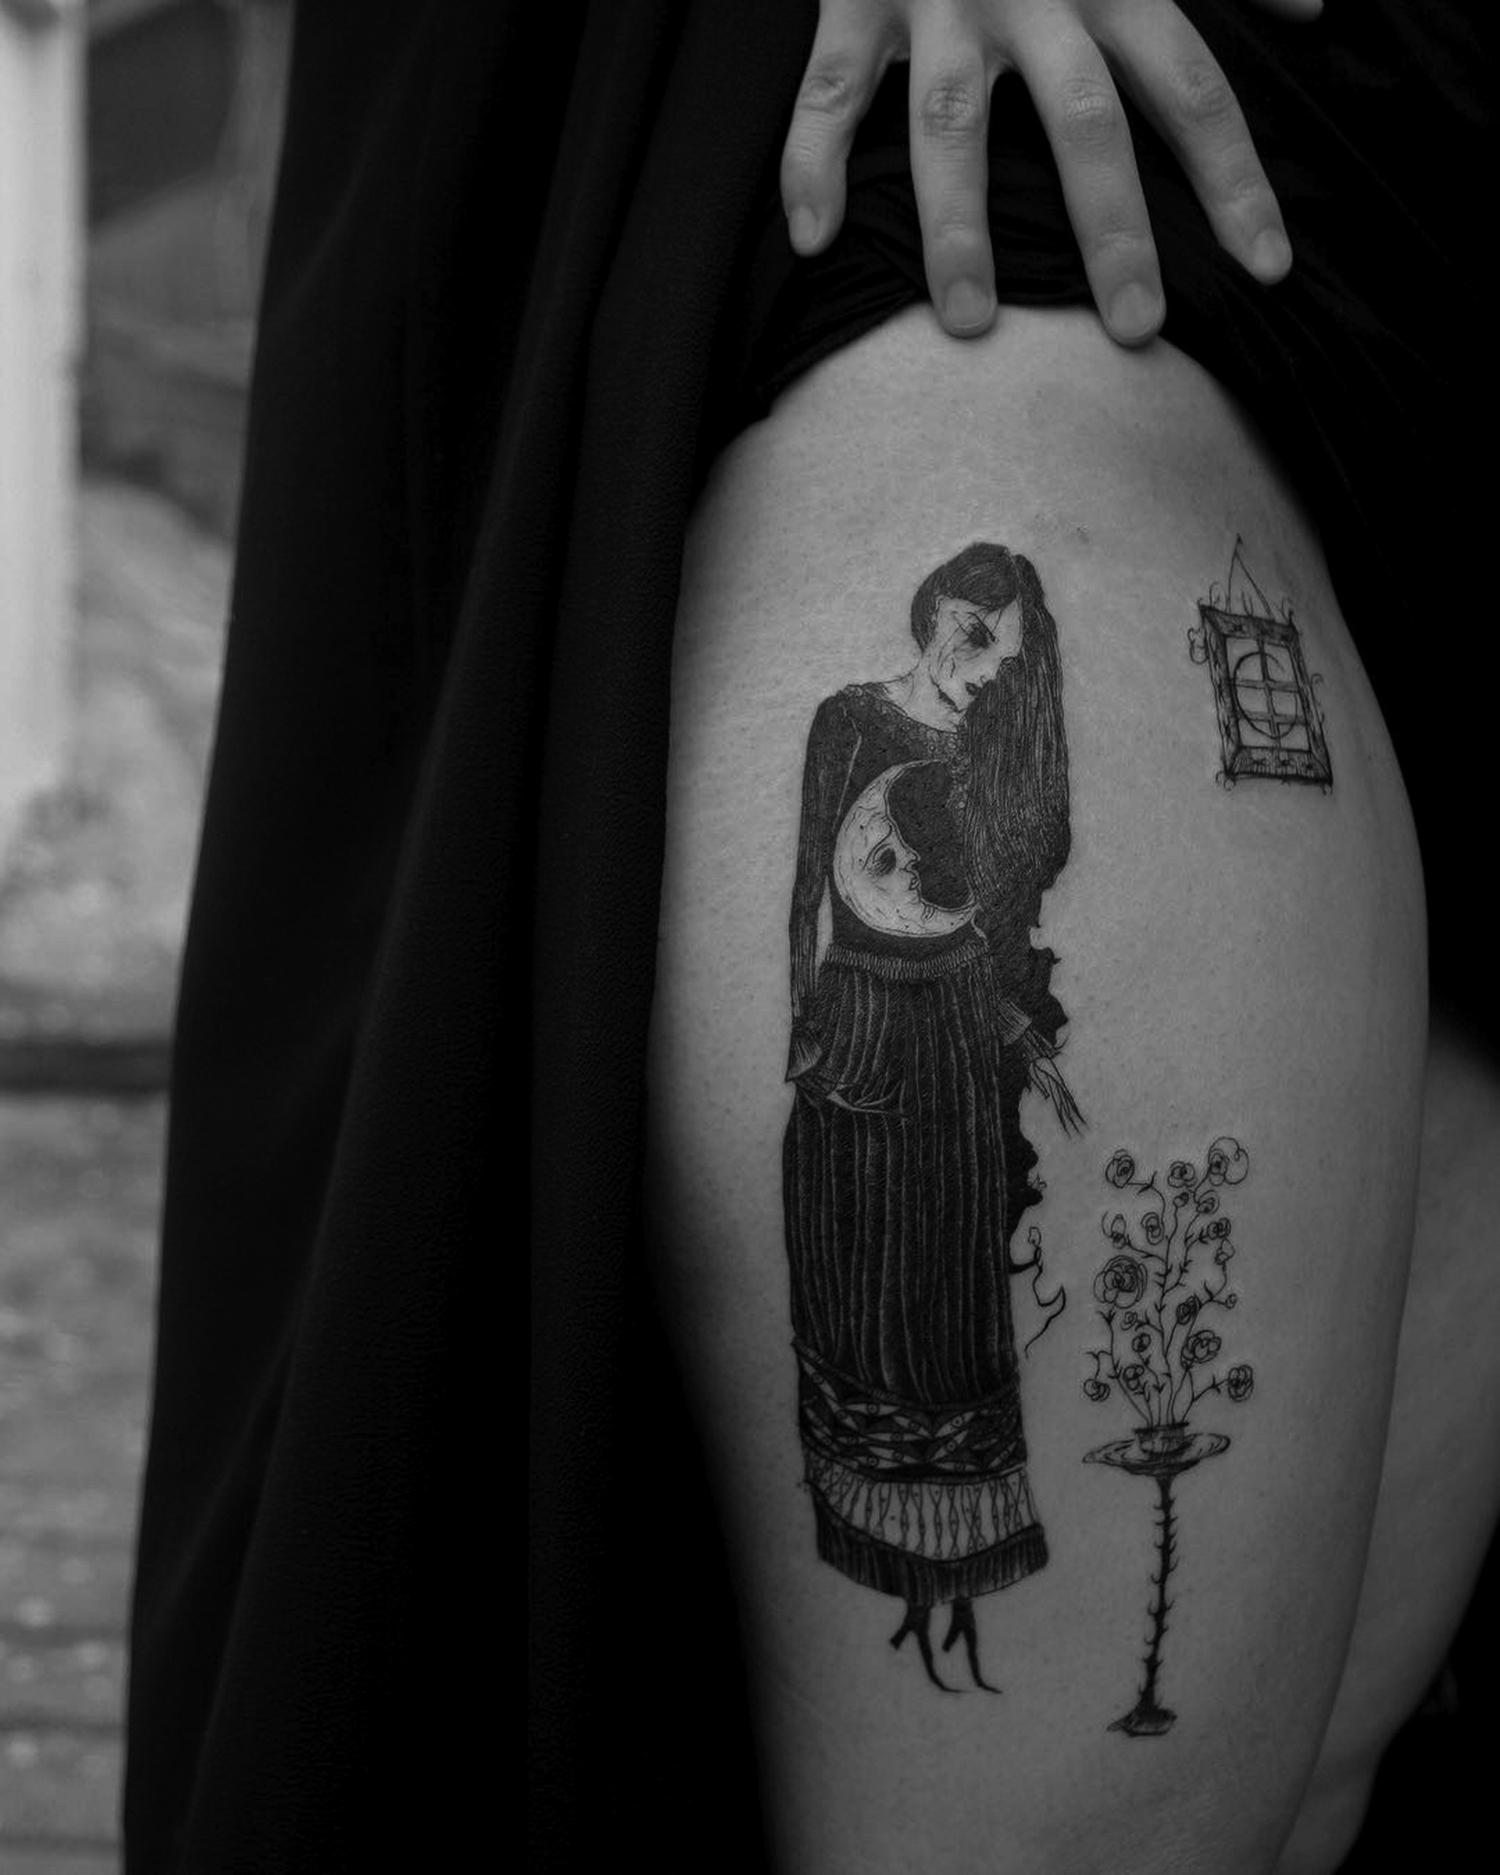 Suhwan Bak - Goth Gloomy tattoo - creepy figure